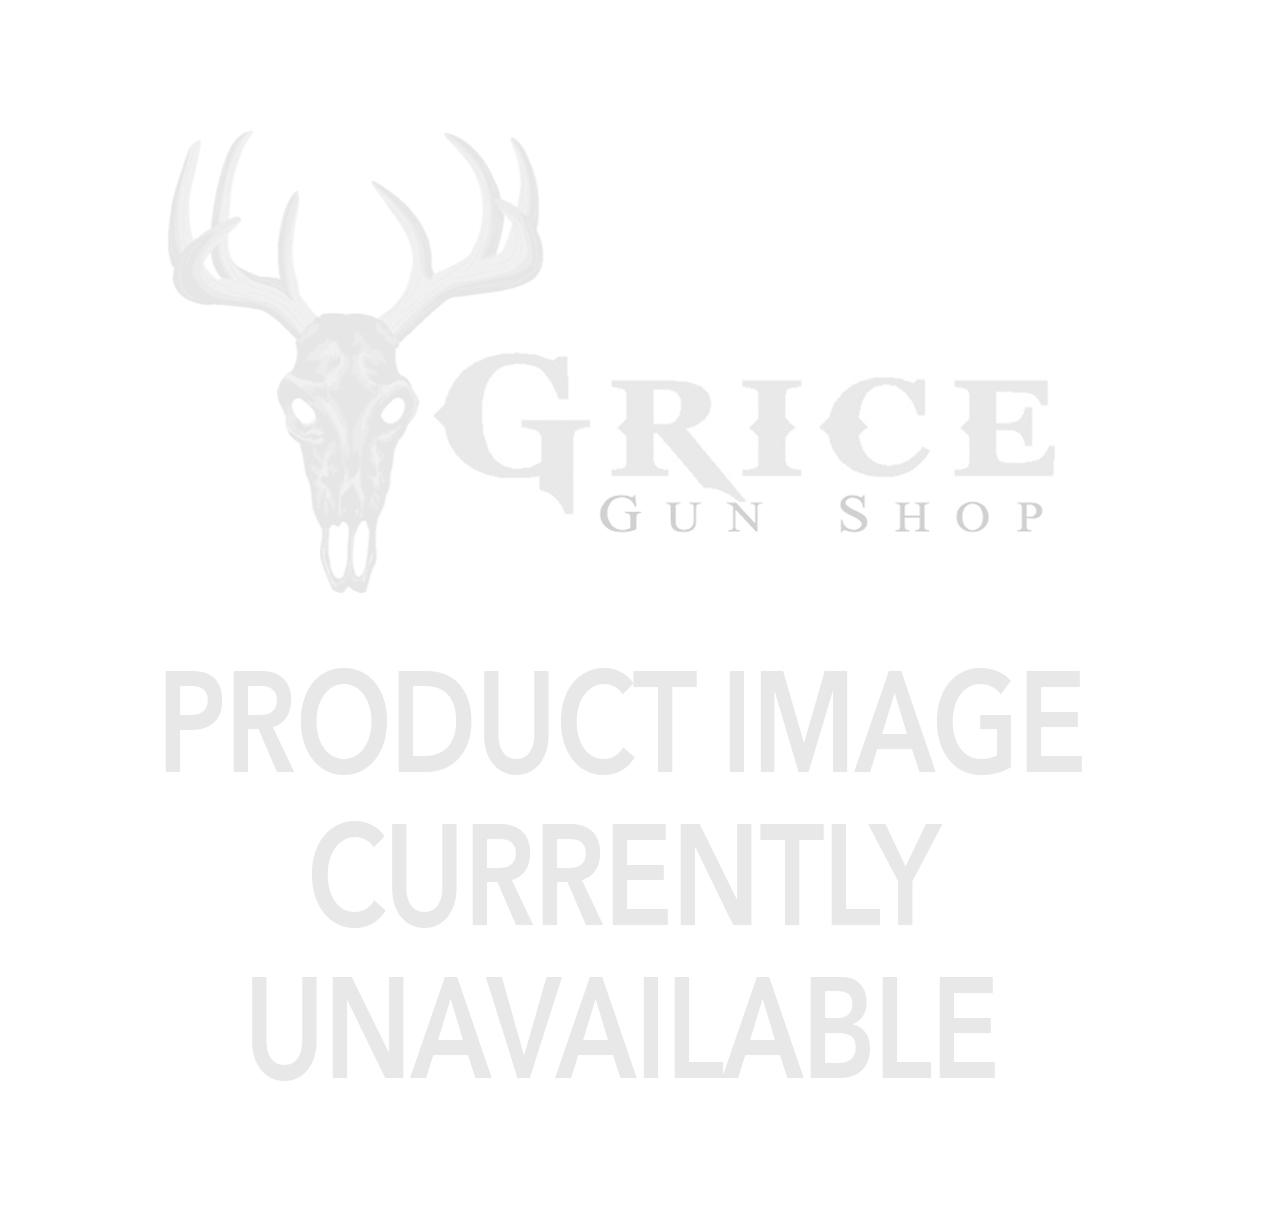 Nightforce - TS-82 Xtreme Hi-Def Spotting Scope 20-70x82mm (Straight Eyepiece)